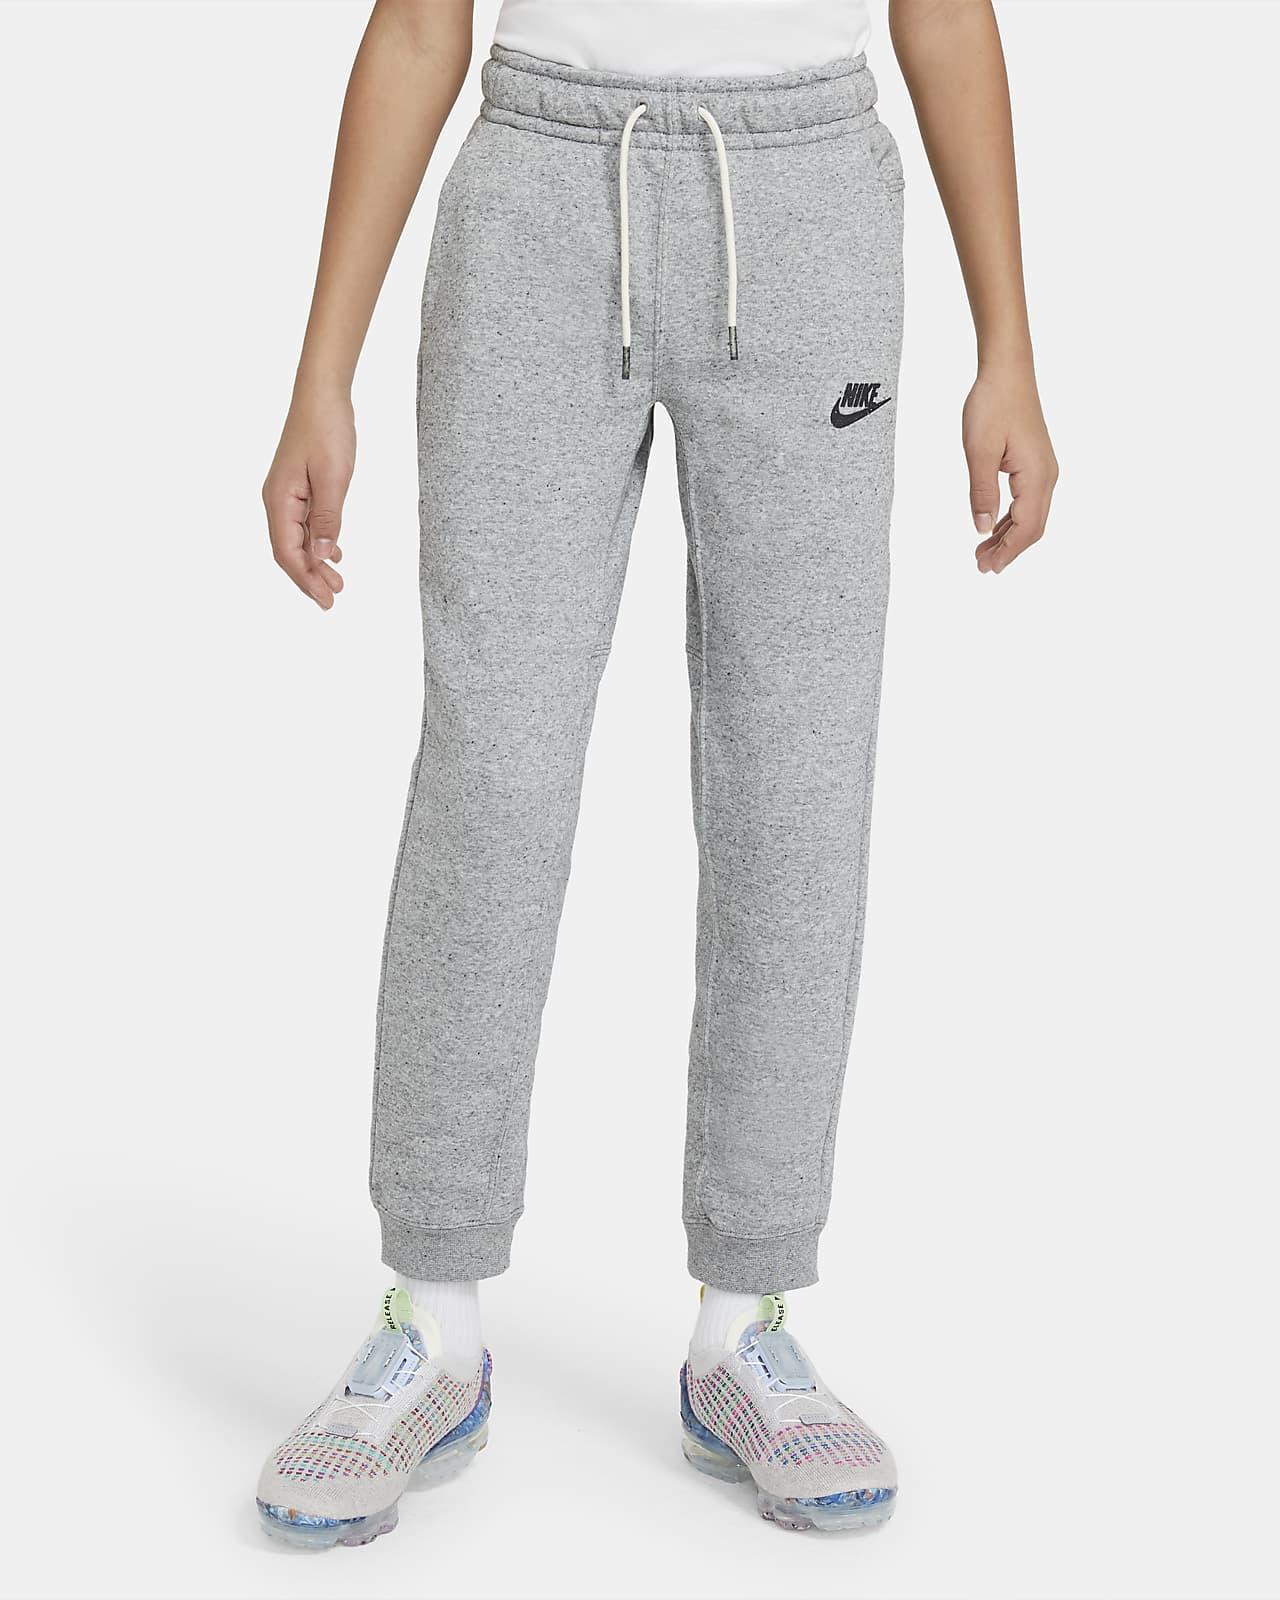 Pantalones De Entrenamiento Para Ninos Talla Grande Nike Sportswear Zero Nike Com